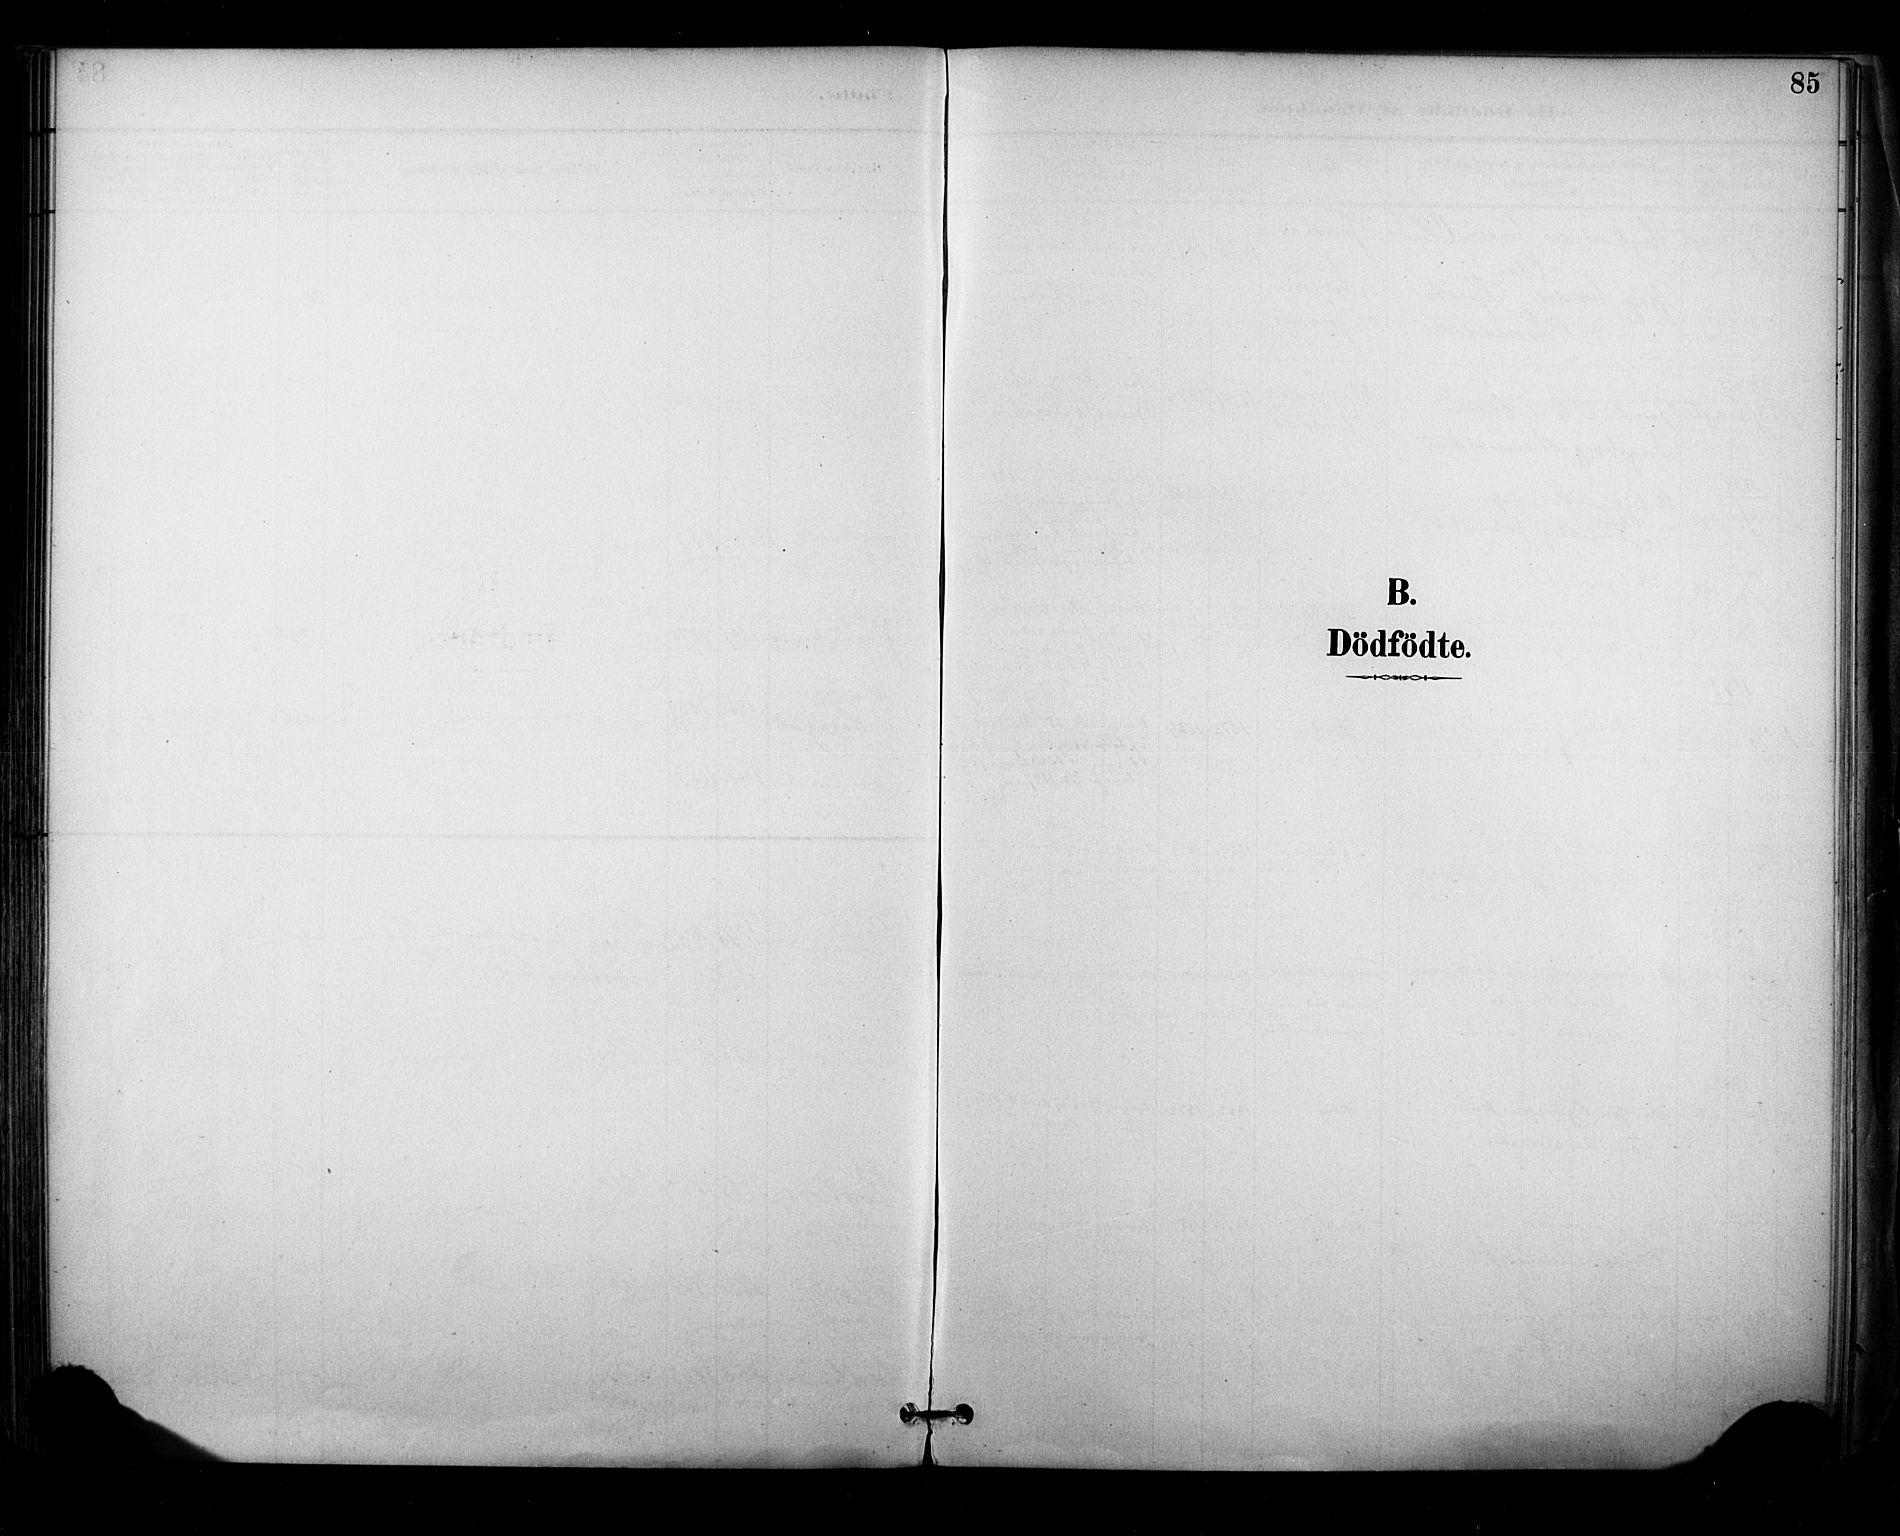 SAKO, Sauherad kirkebøker, F/Fa/L0009: Ministerialbok nr. I 9, 1887-1912, s. 85